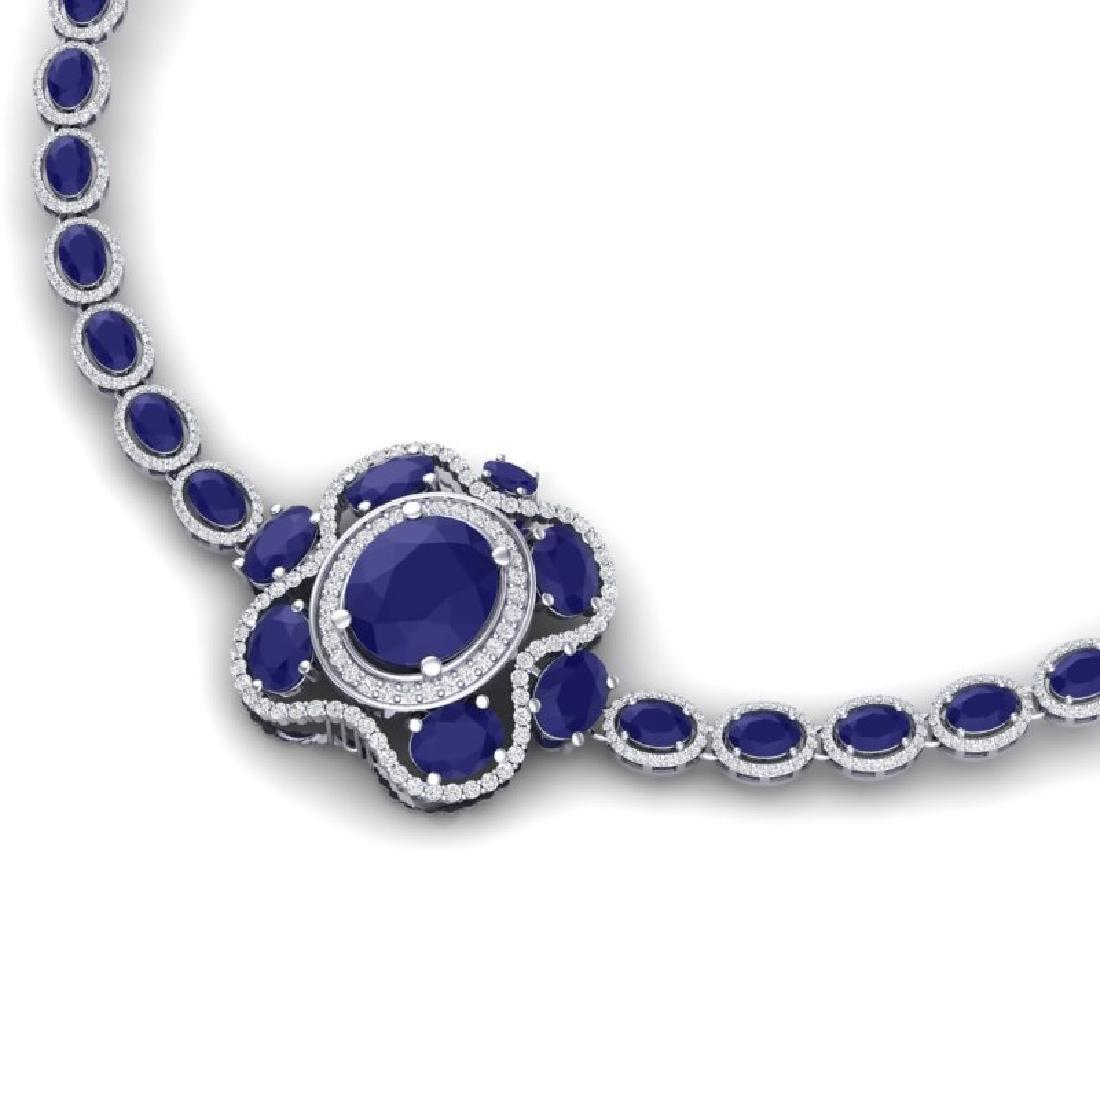 47.43 CTW Royalty Sapphire & VS Diamond Necklace 18K